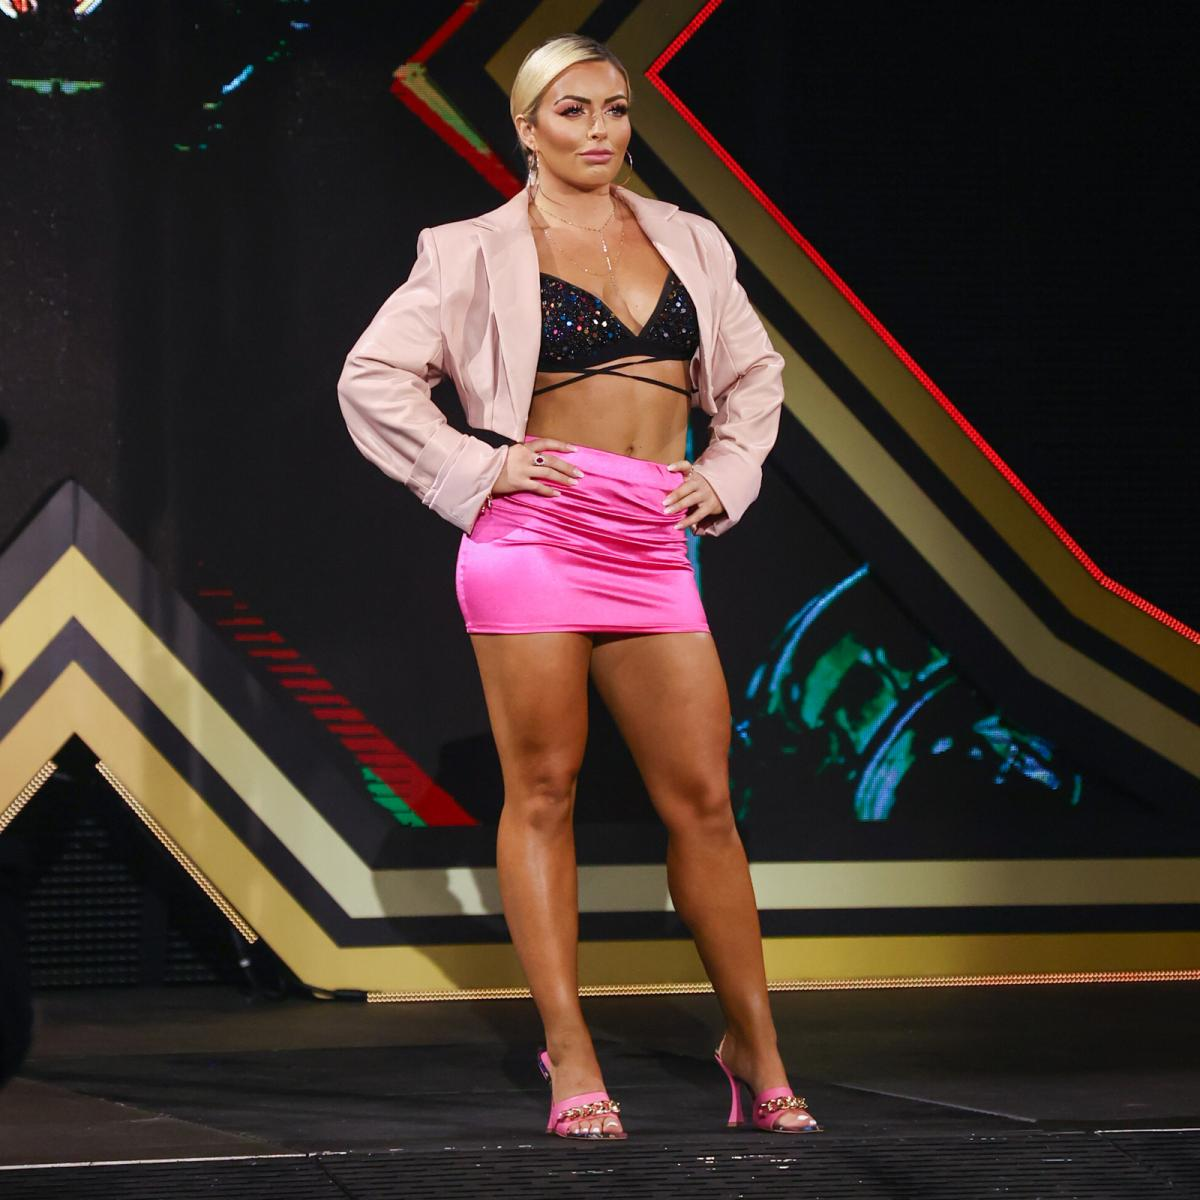 NXT大会のサレイ戦を視察したロウ所属のマンディ・ローズ(C)2021 WWE, Inc. All Rights Reserved.